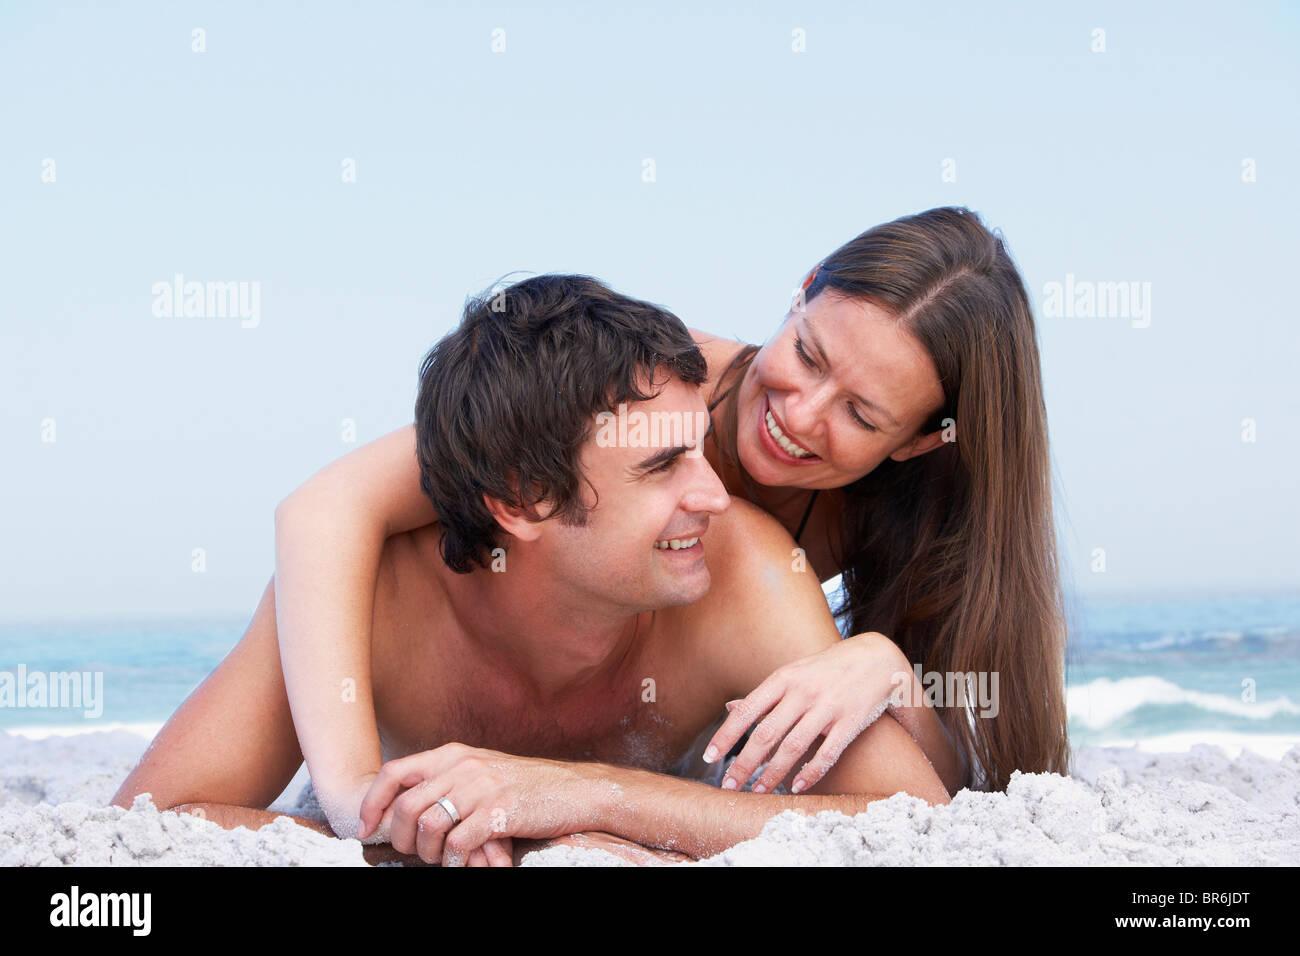 Young Couple Relaxing On Beach Wearing Swimwear - Stock Image